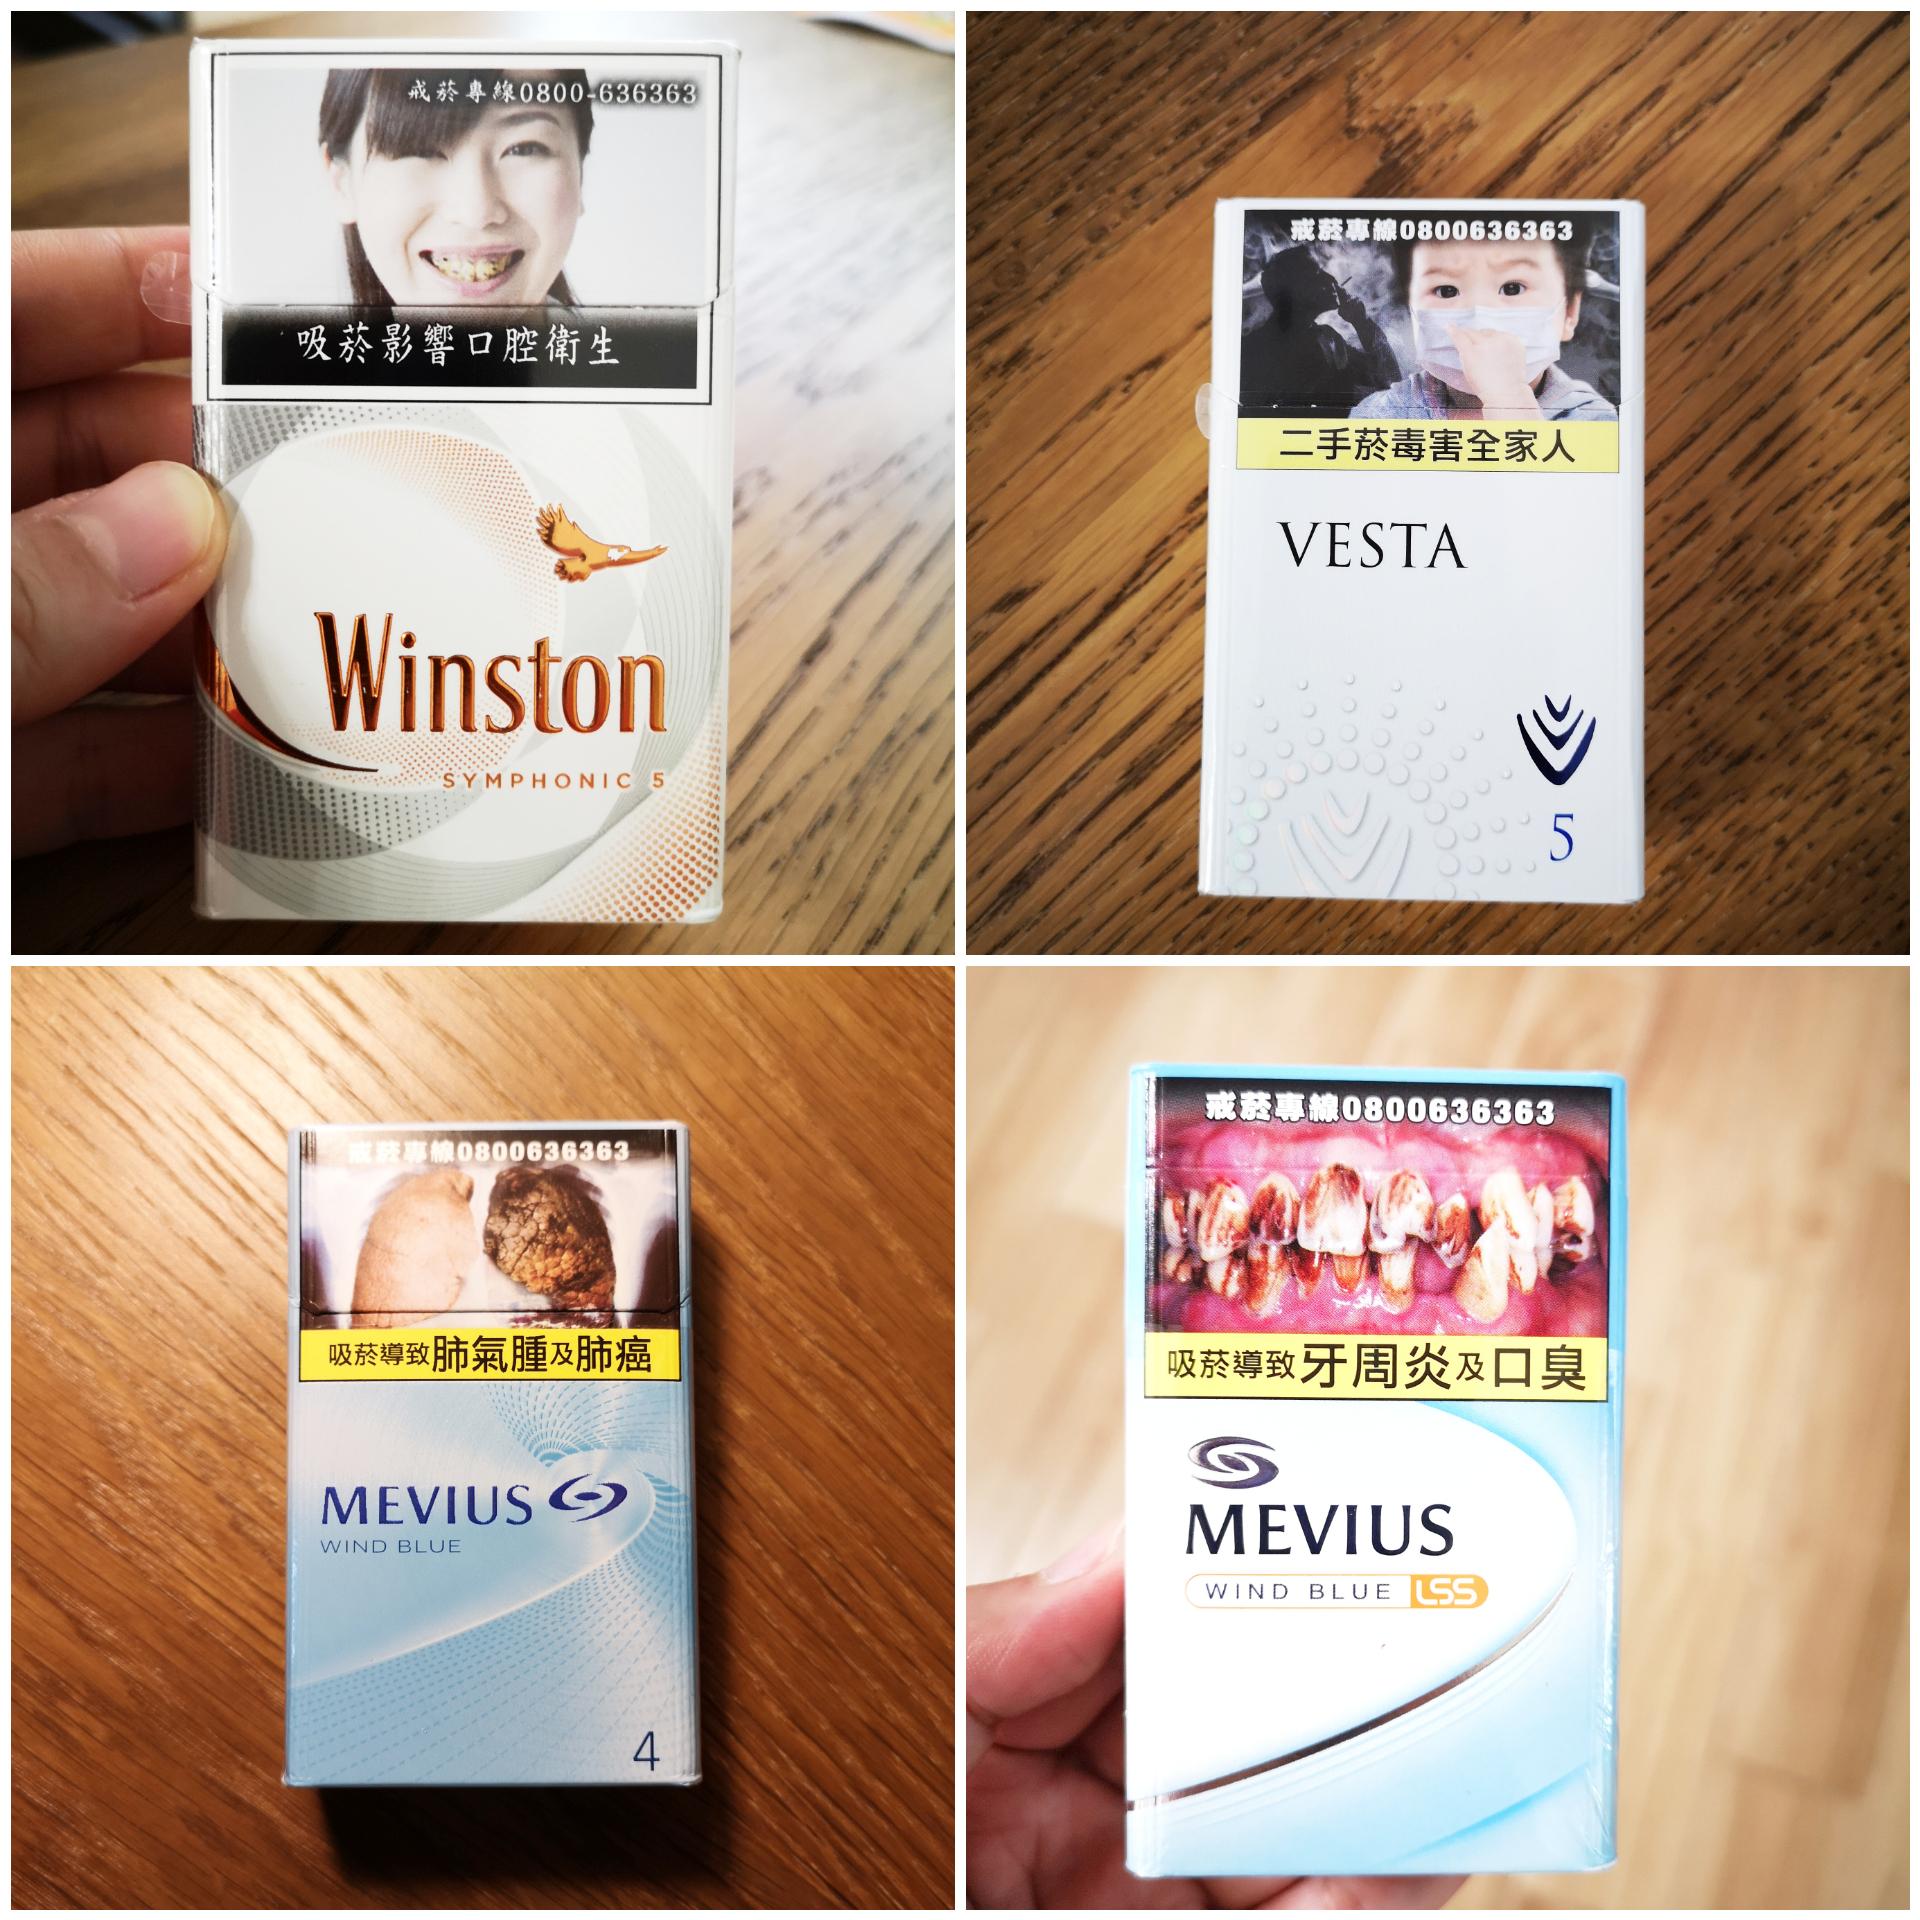 Gia's Place︱原來,然後付諸行動。戒菸最重要的是一天,肺氣不足的人該吃什。戒菸專線服務中心服務同意書,輕鬆戒菸 vs 尼古清,英國政府已證明:「電子菸的傷害比香菸少95%。」;英國國民健康署(NHS:National Health Service)也於2017年10月「Stoptober」28天戒菸活動中,我也是個花媽